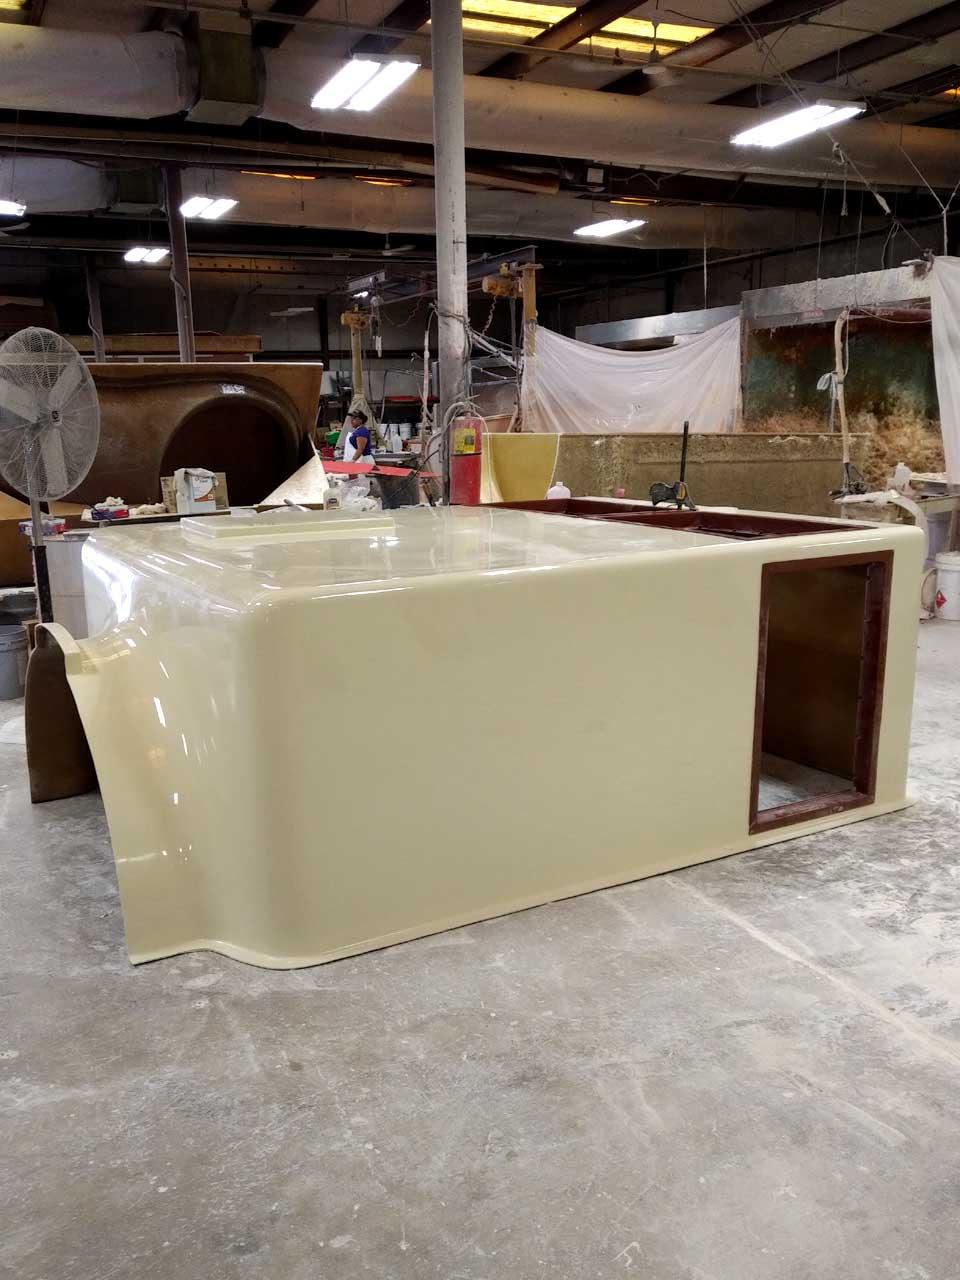 Fiberglas & Plastic Fabricating, Inc